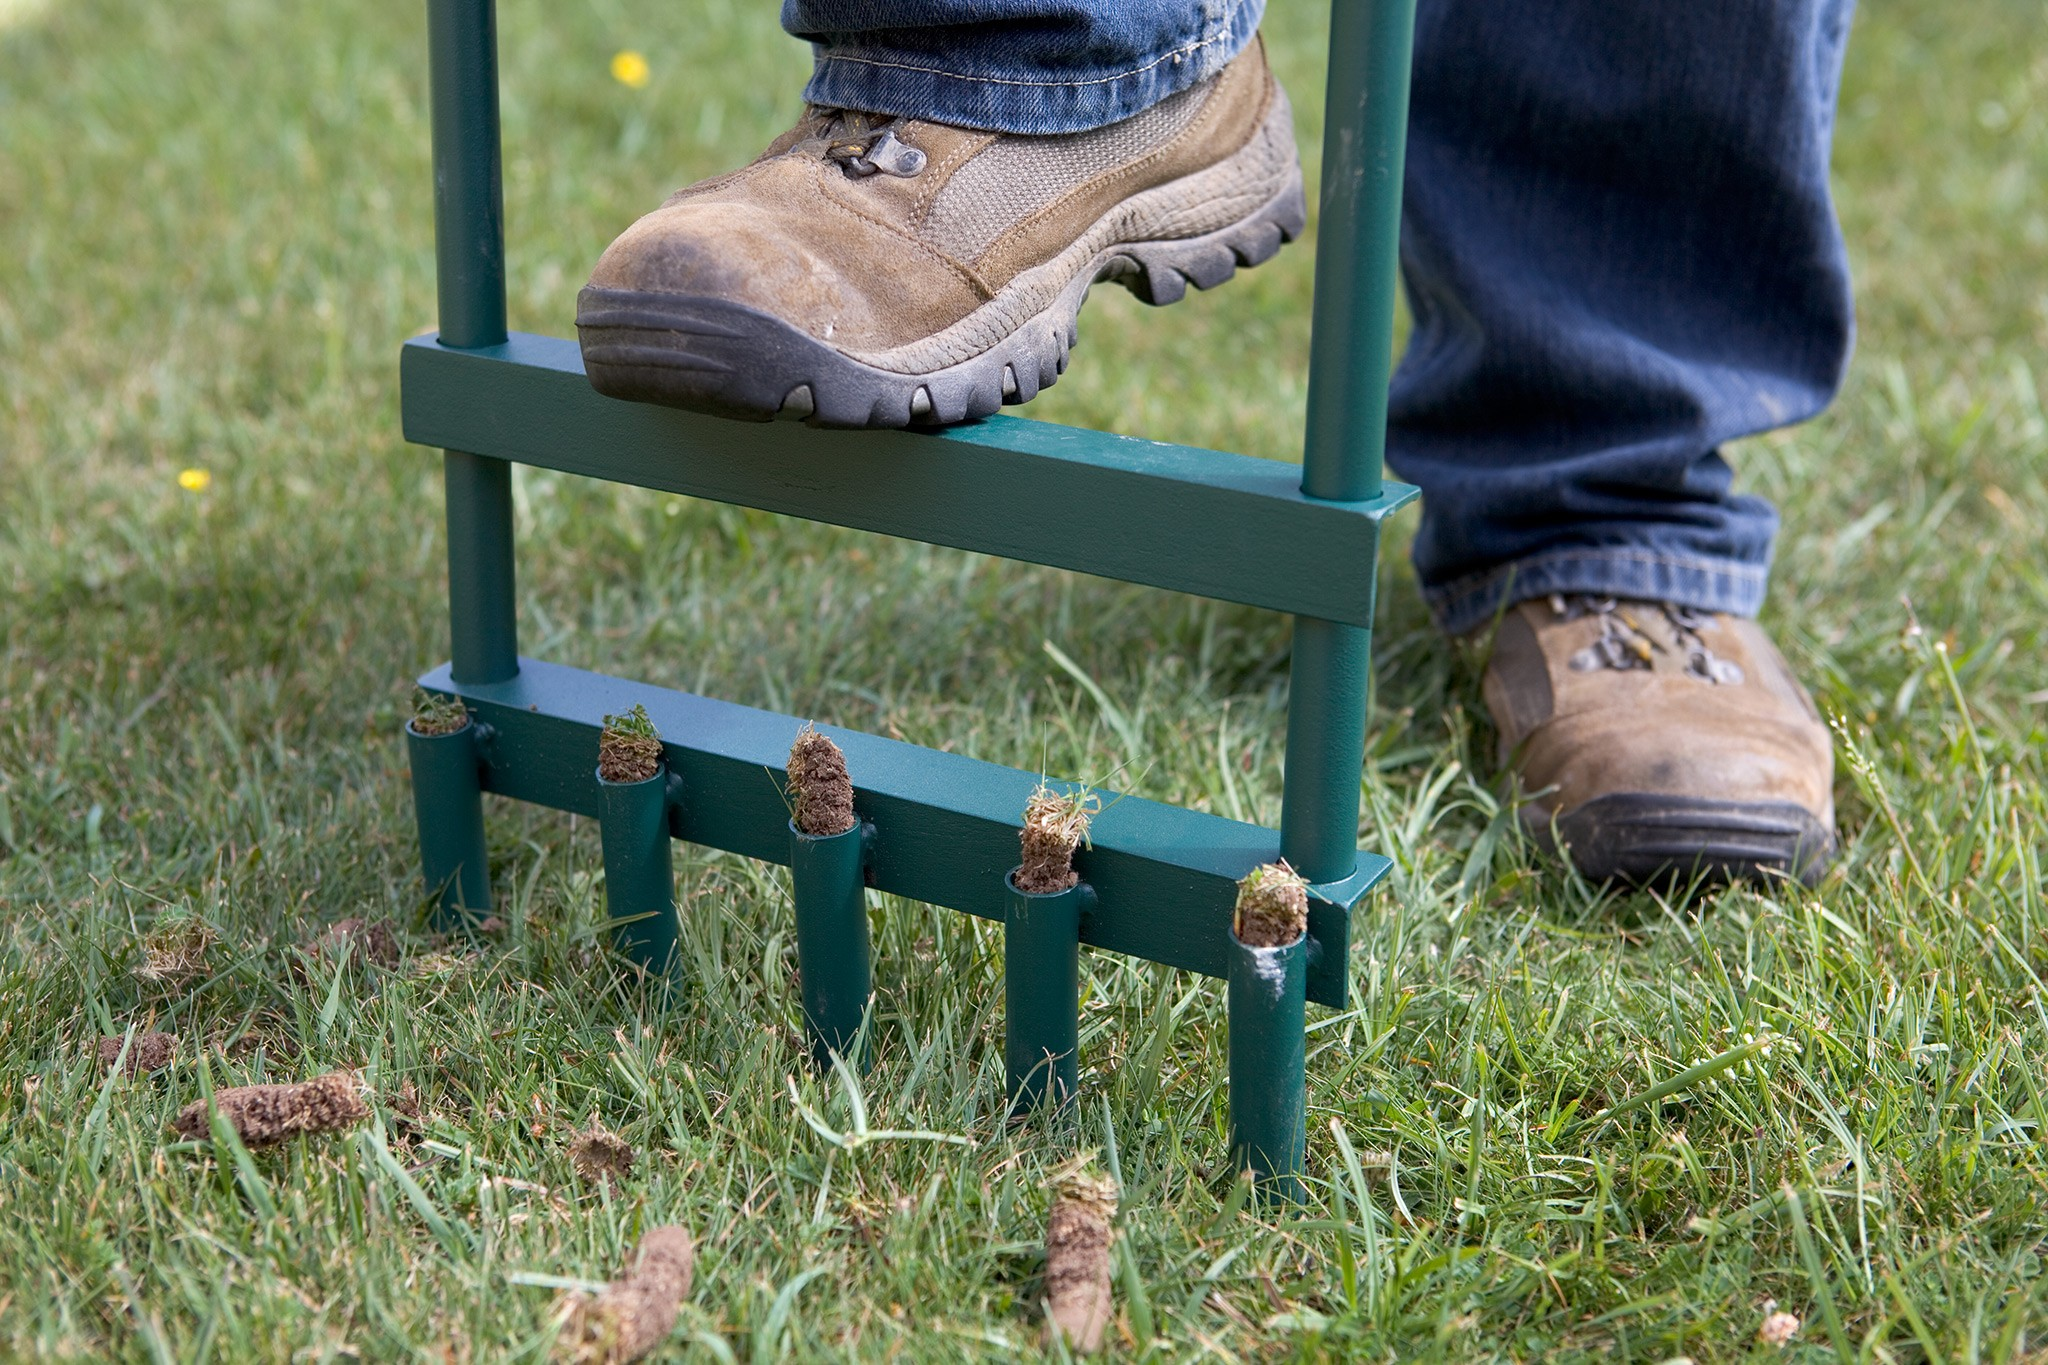 Aerating the soil